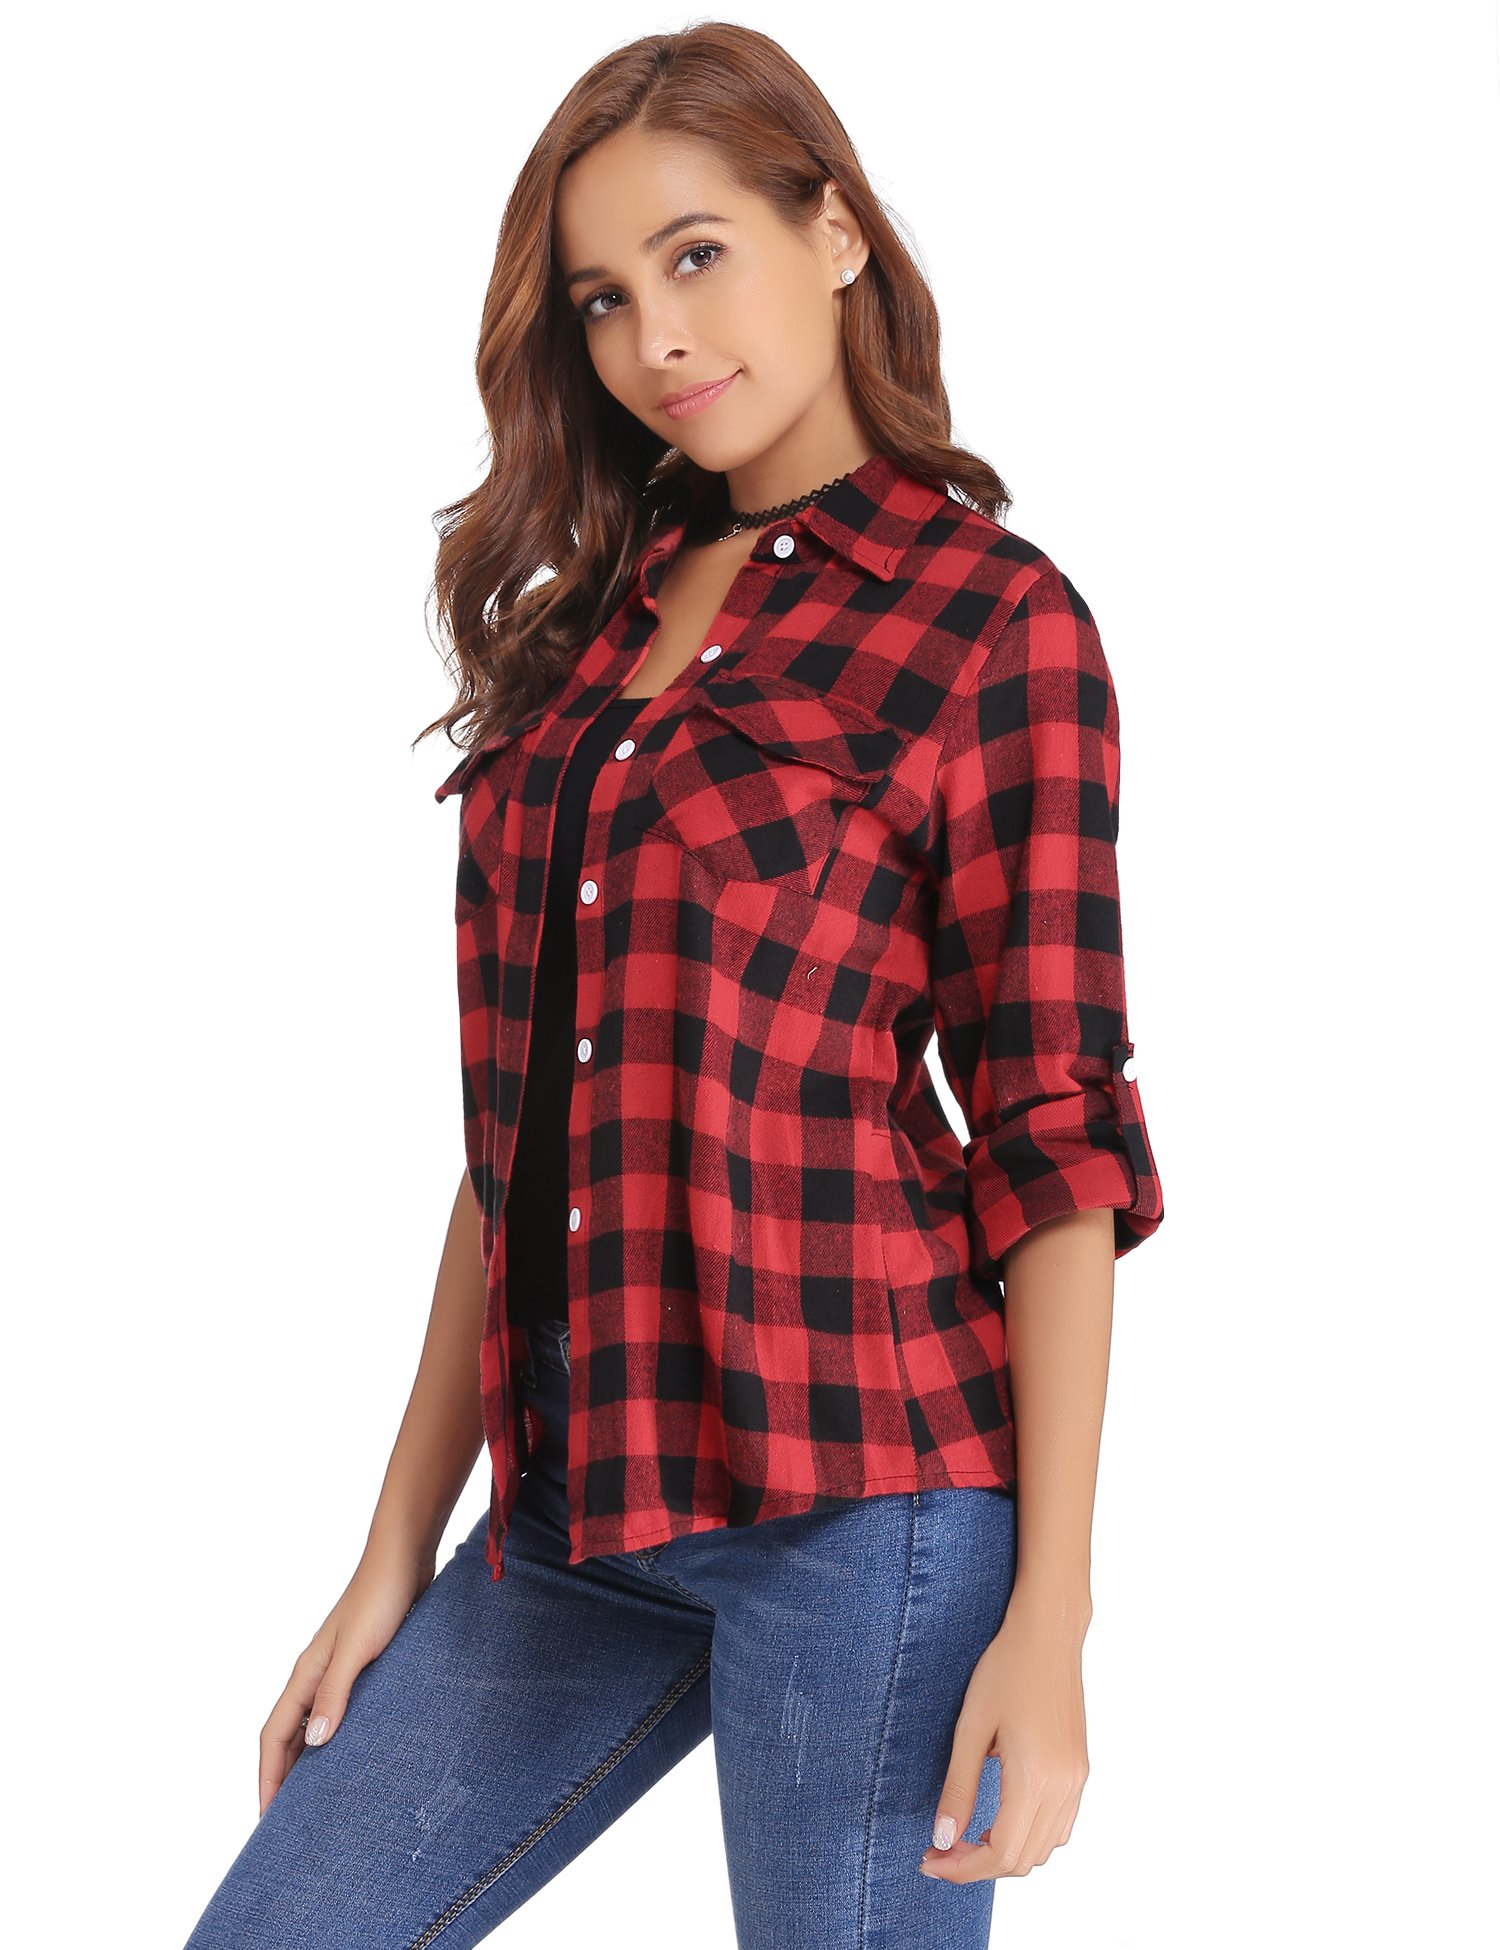 Abollria Women's Roll up Long Sleeve Boyfriend Button Down Plaid Flannel Shirt (Red,M